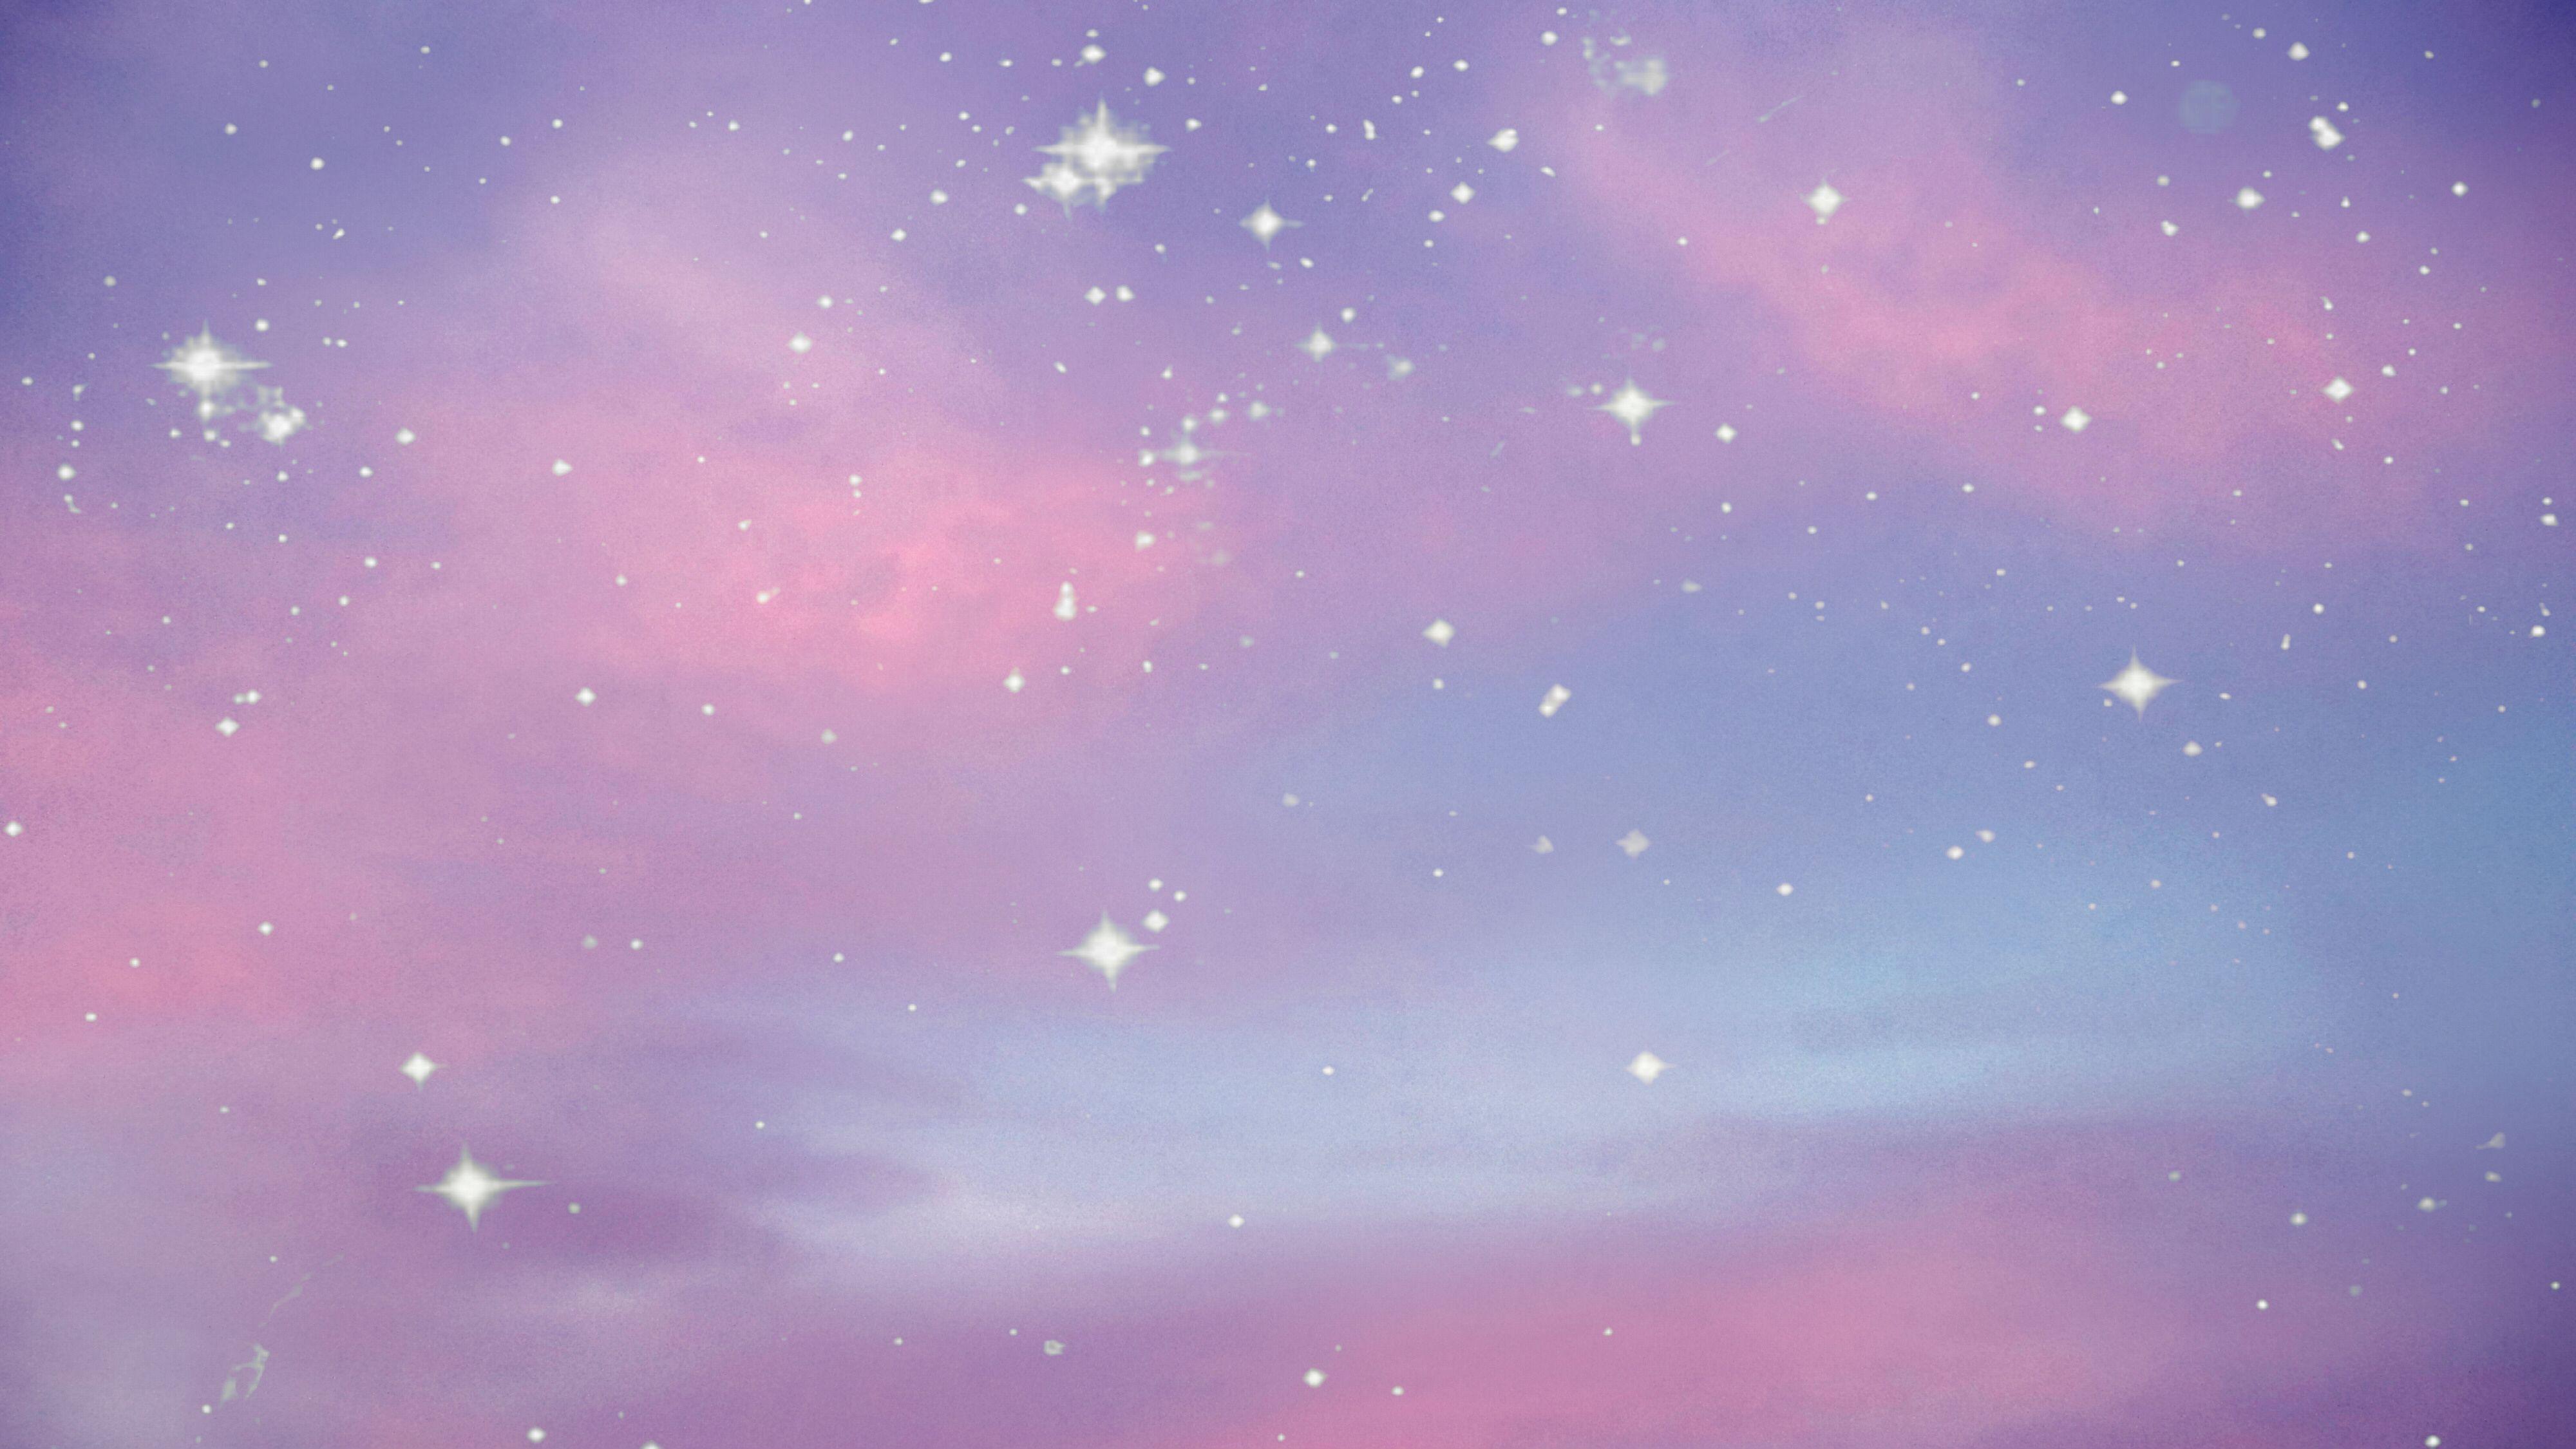 light purple aesthetic laptop wallpapers